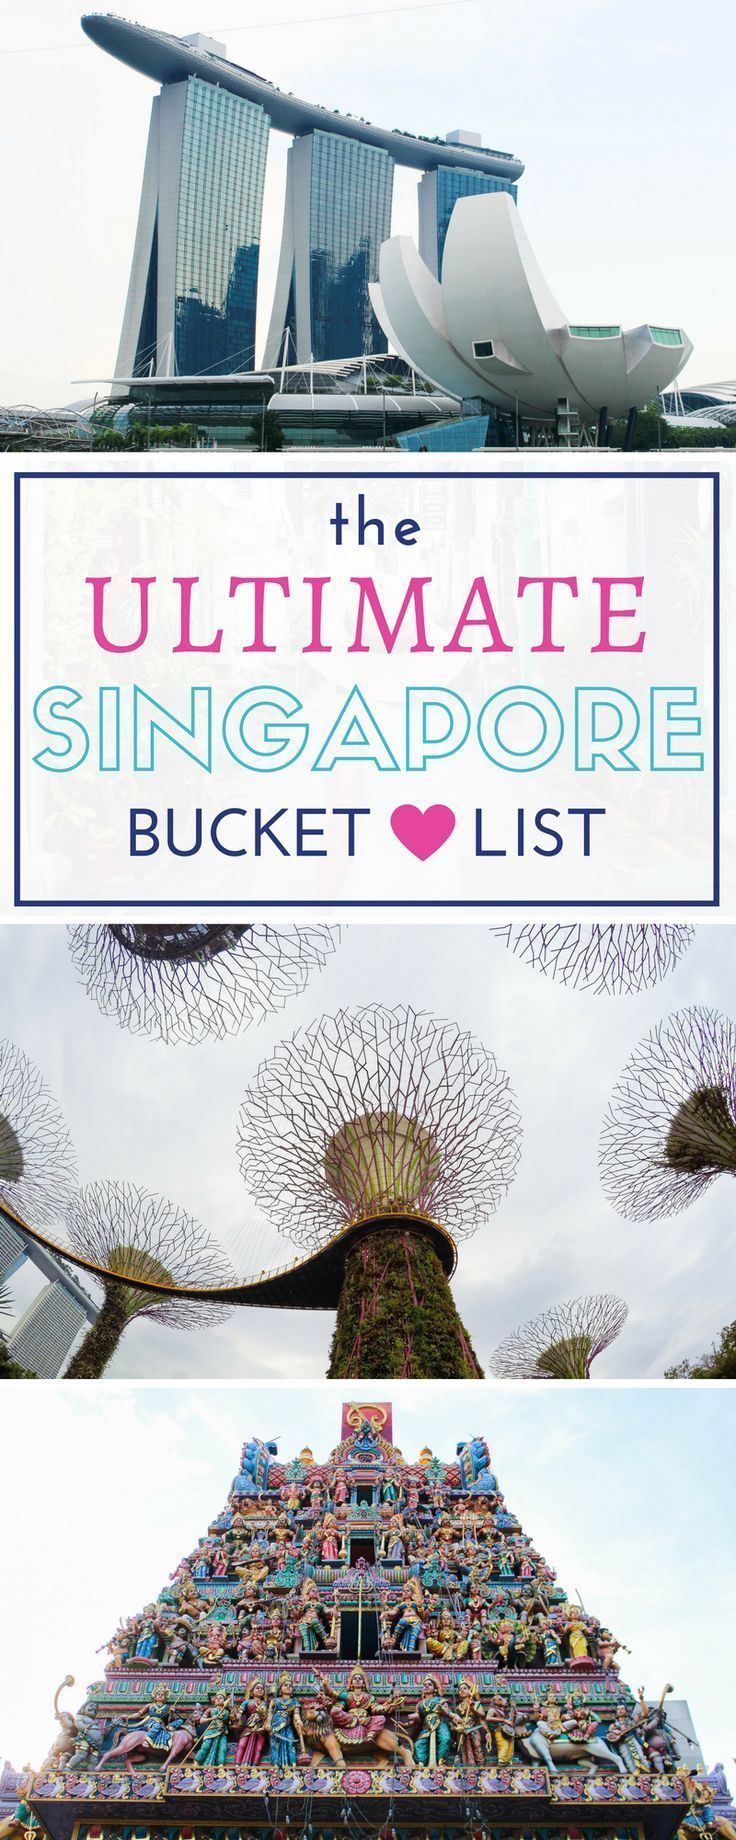 Bucket List Ideas the Greatest List Ever Travel Travel